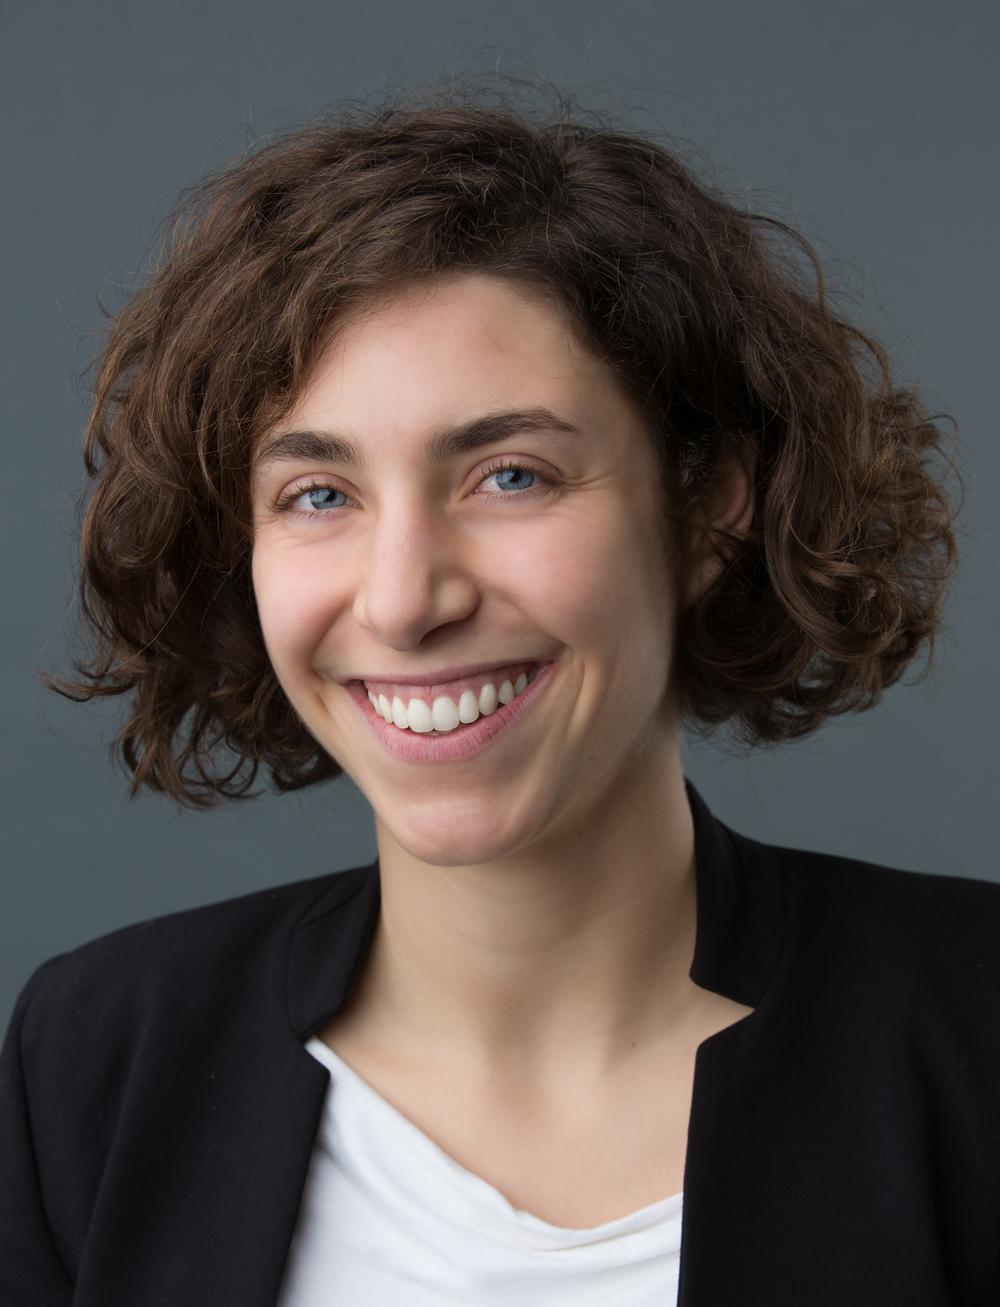 Anabel Cossette Civitella